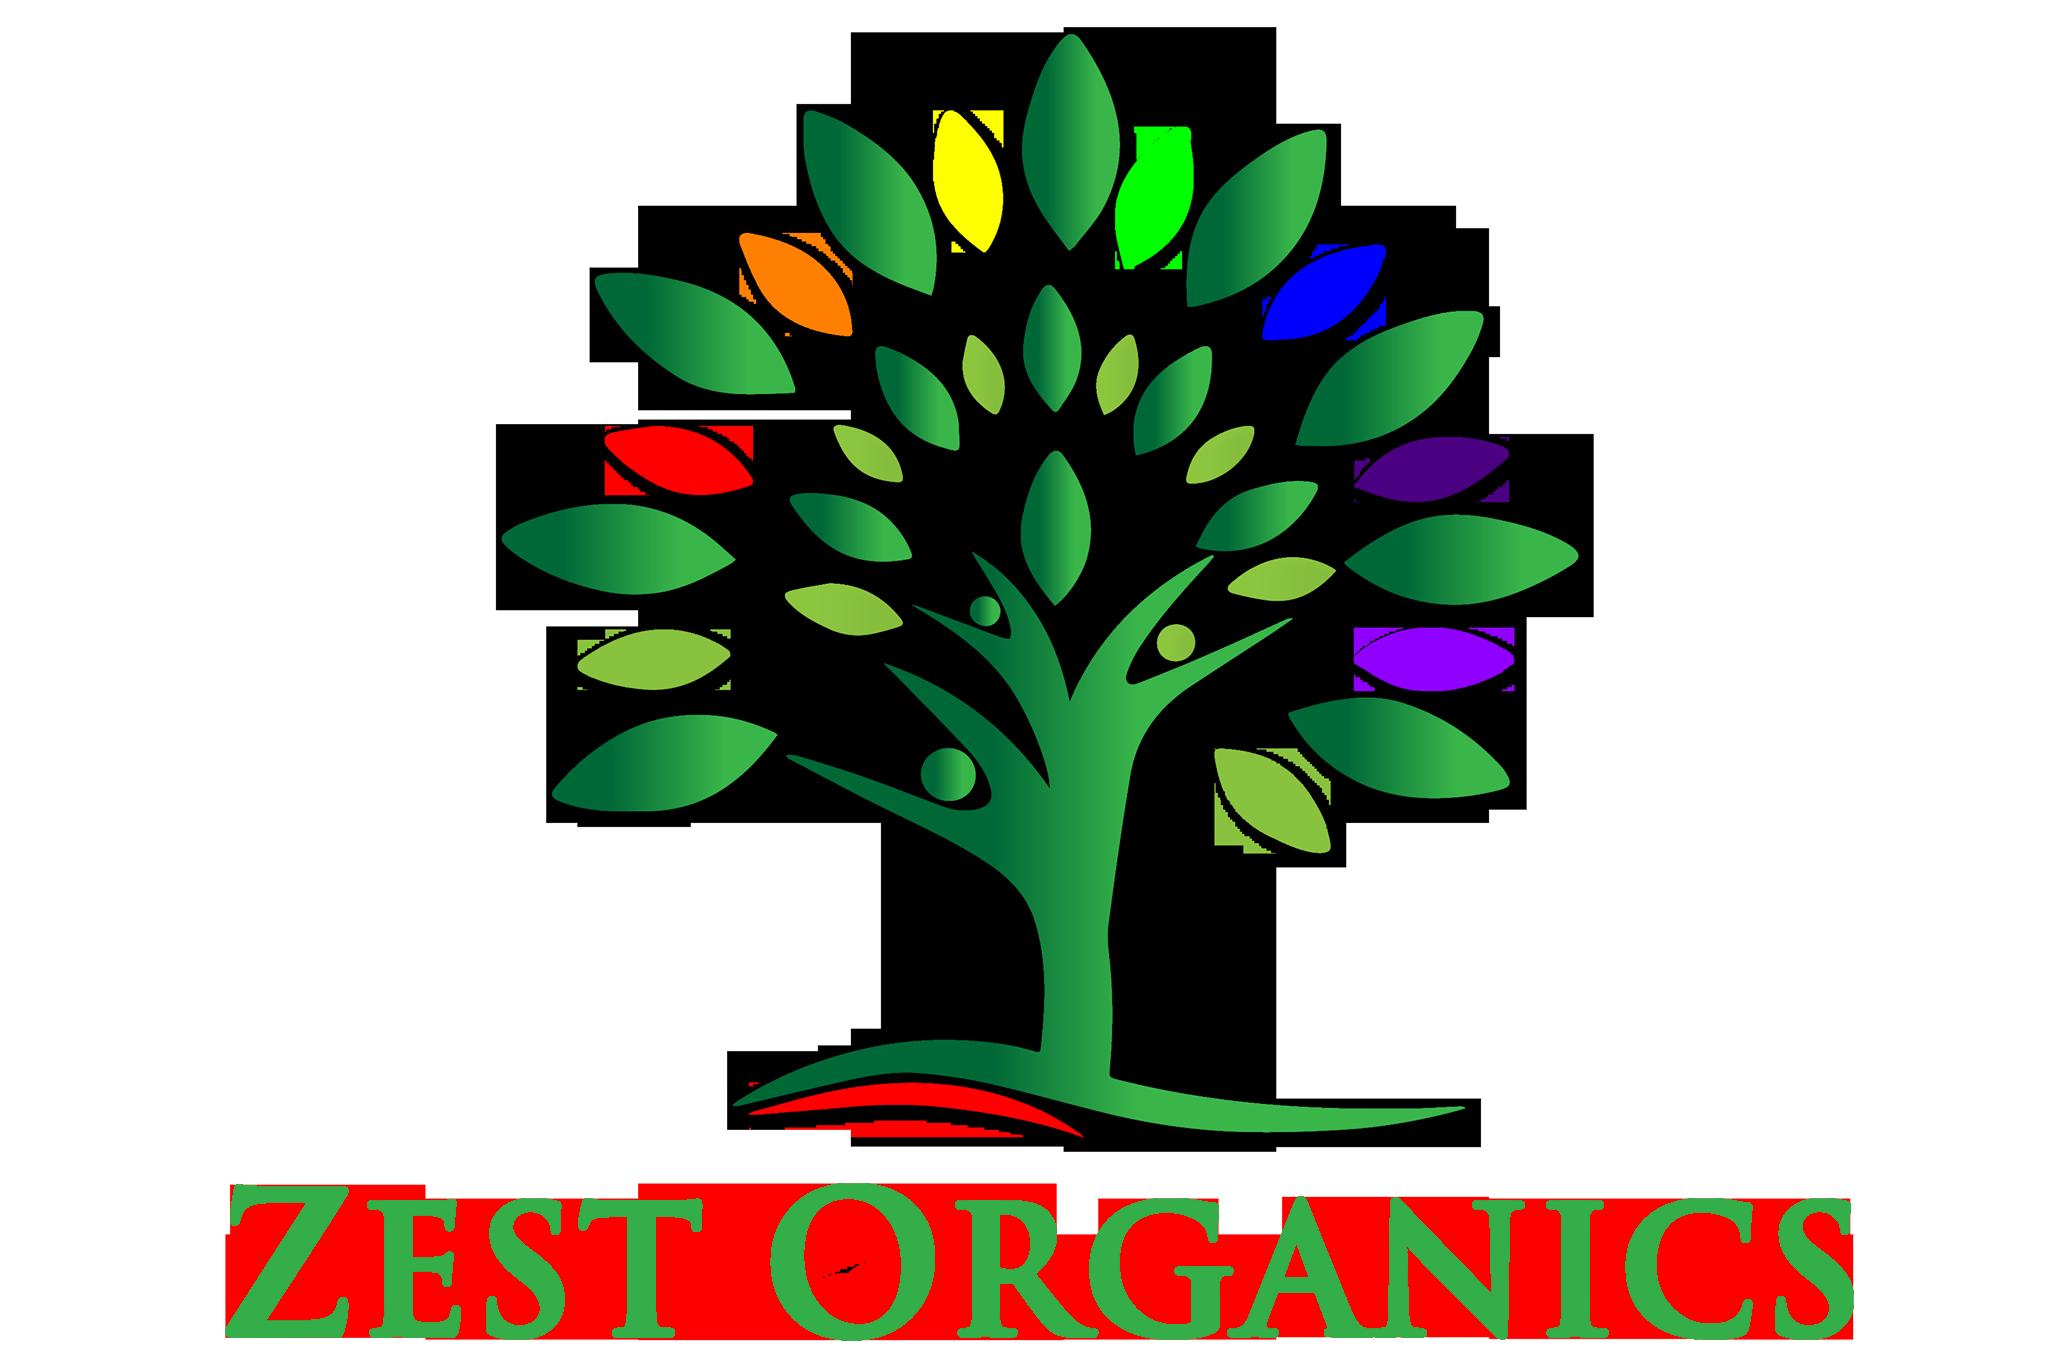 Zest Organics